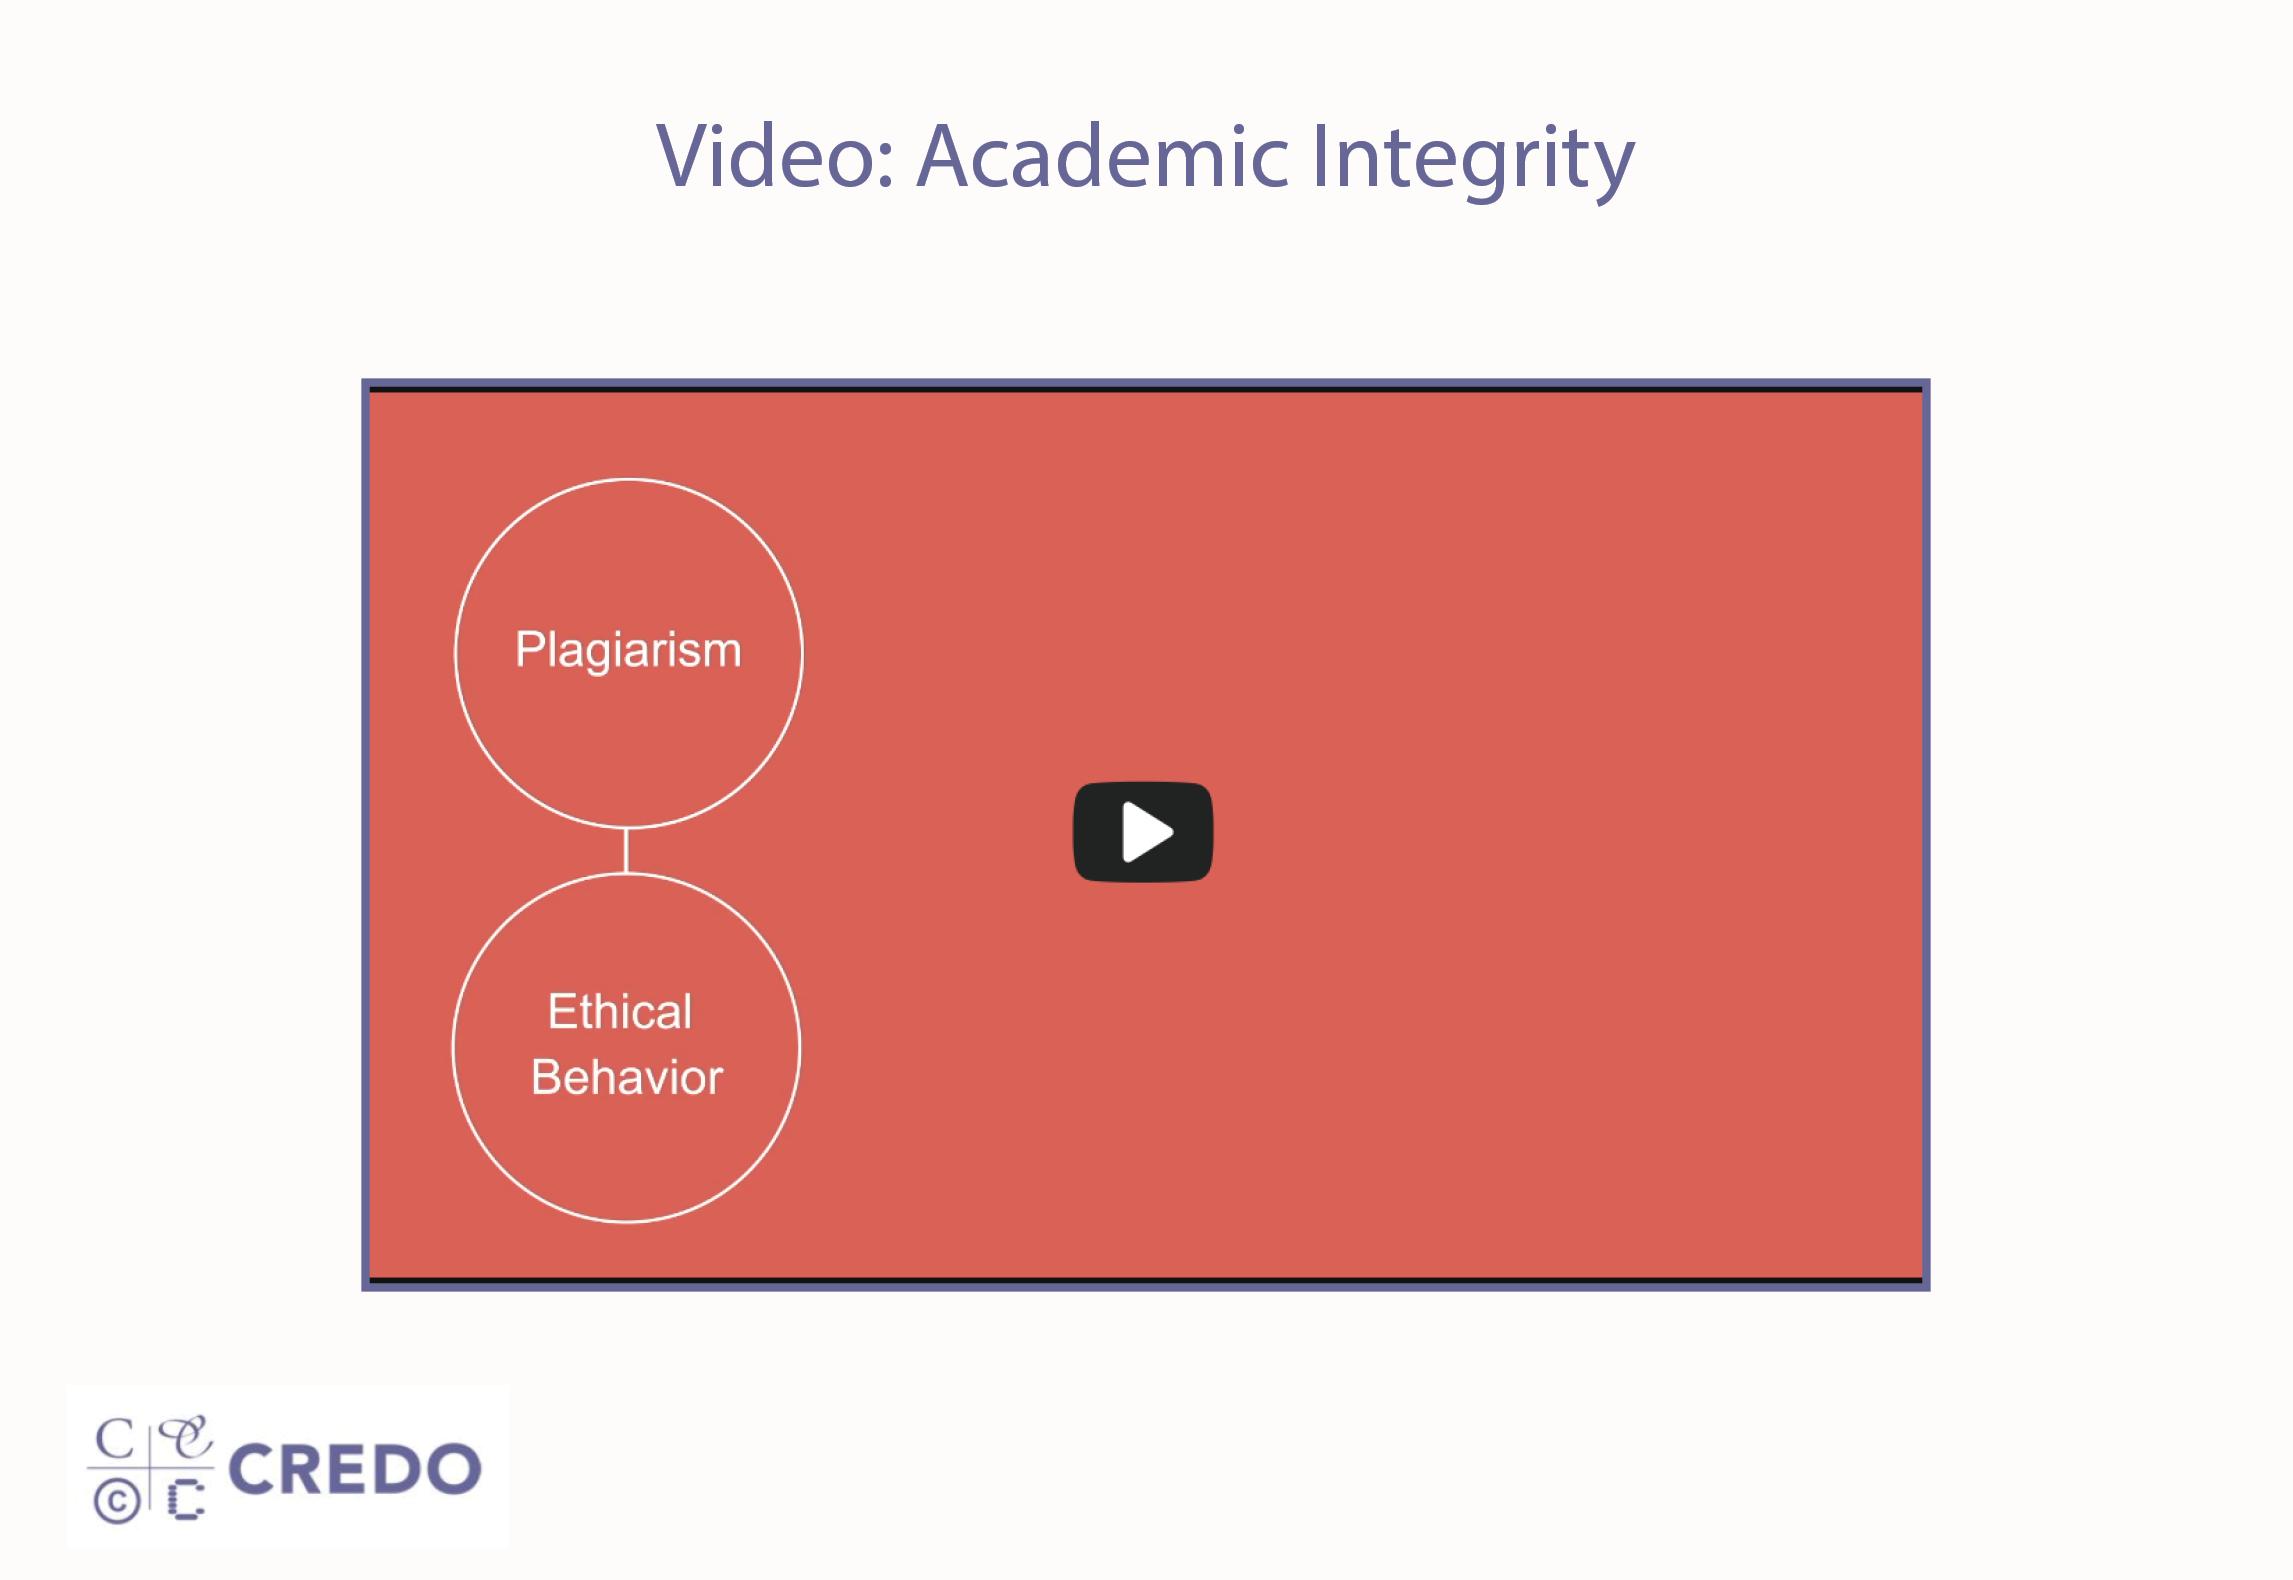 Video: Academic Integrity